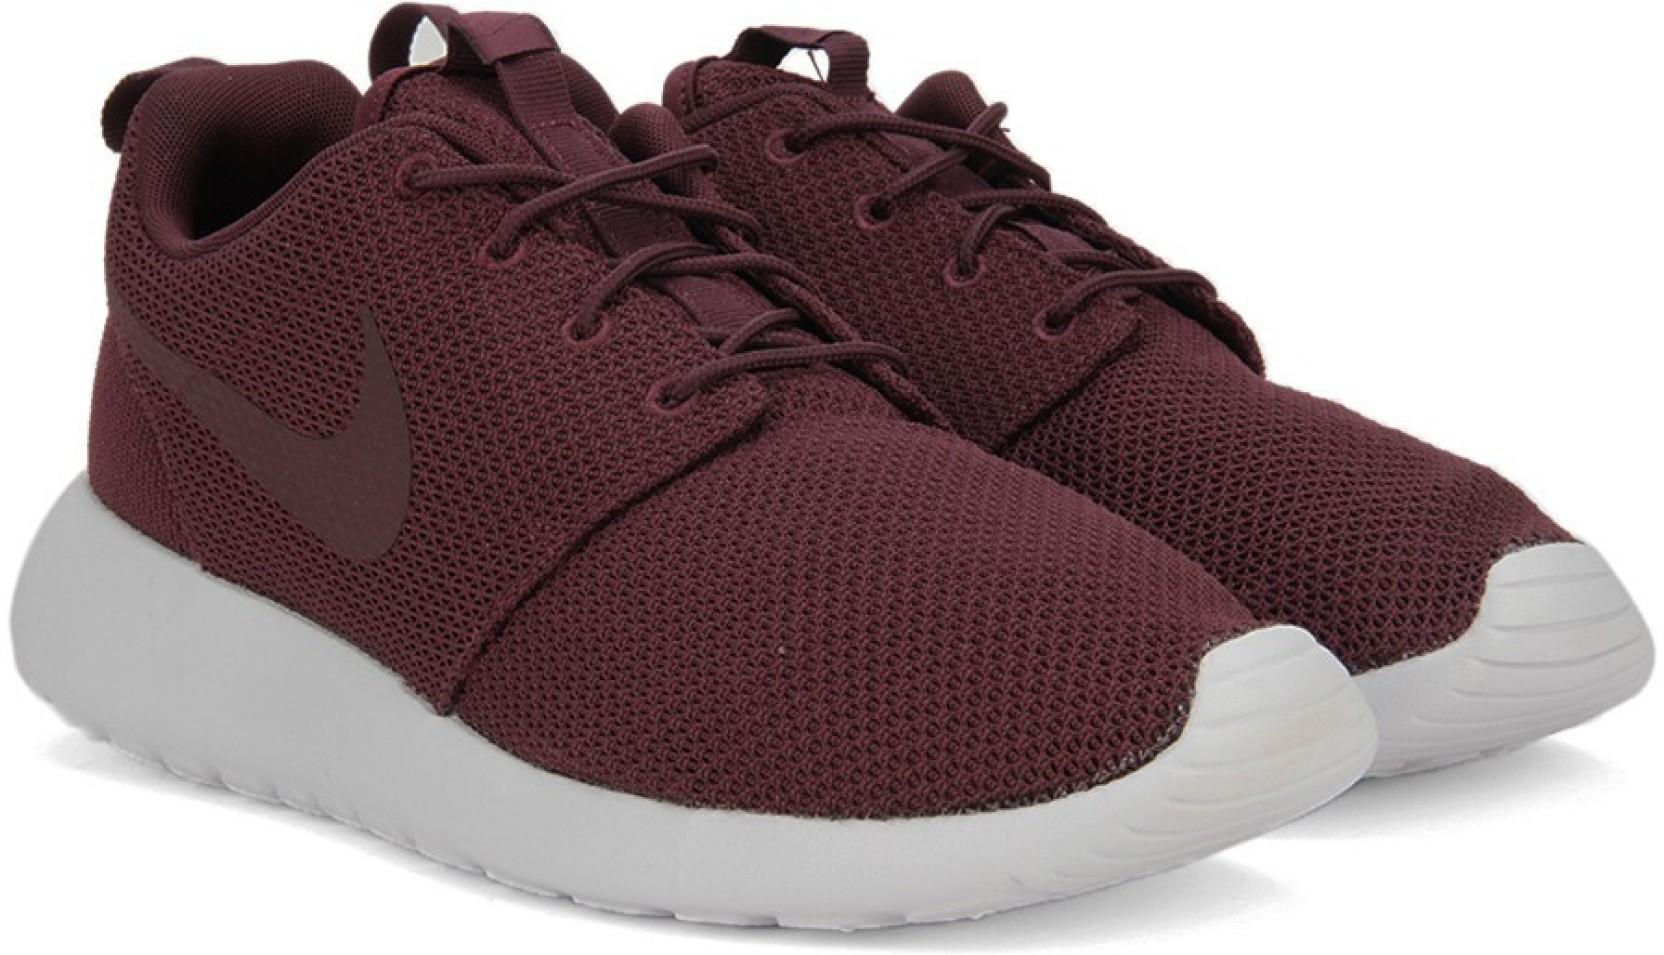 4e9da2433389 Nike ROSHE ONE Sneakers For Men - Buy NIGHT MAROON NIGHT MAROON ...